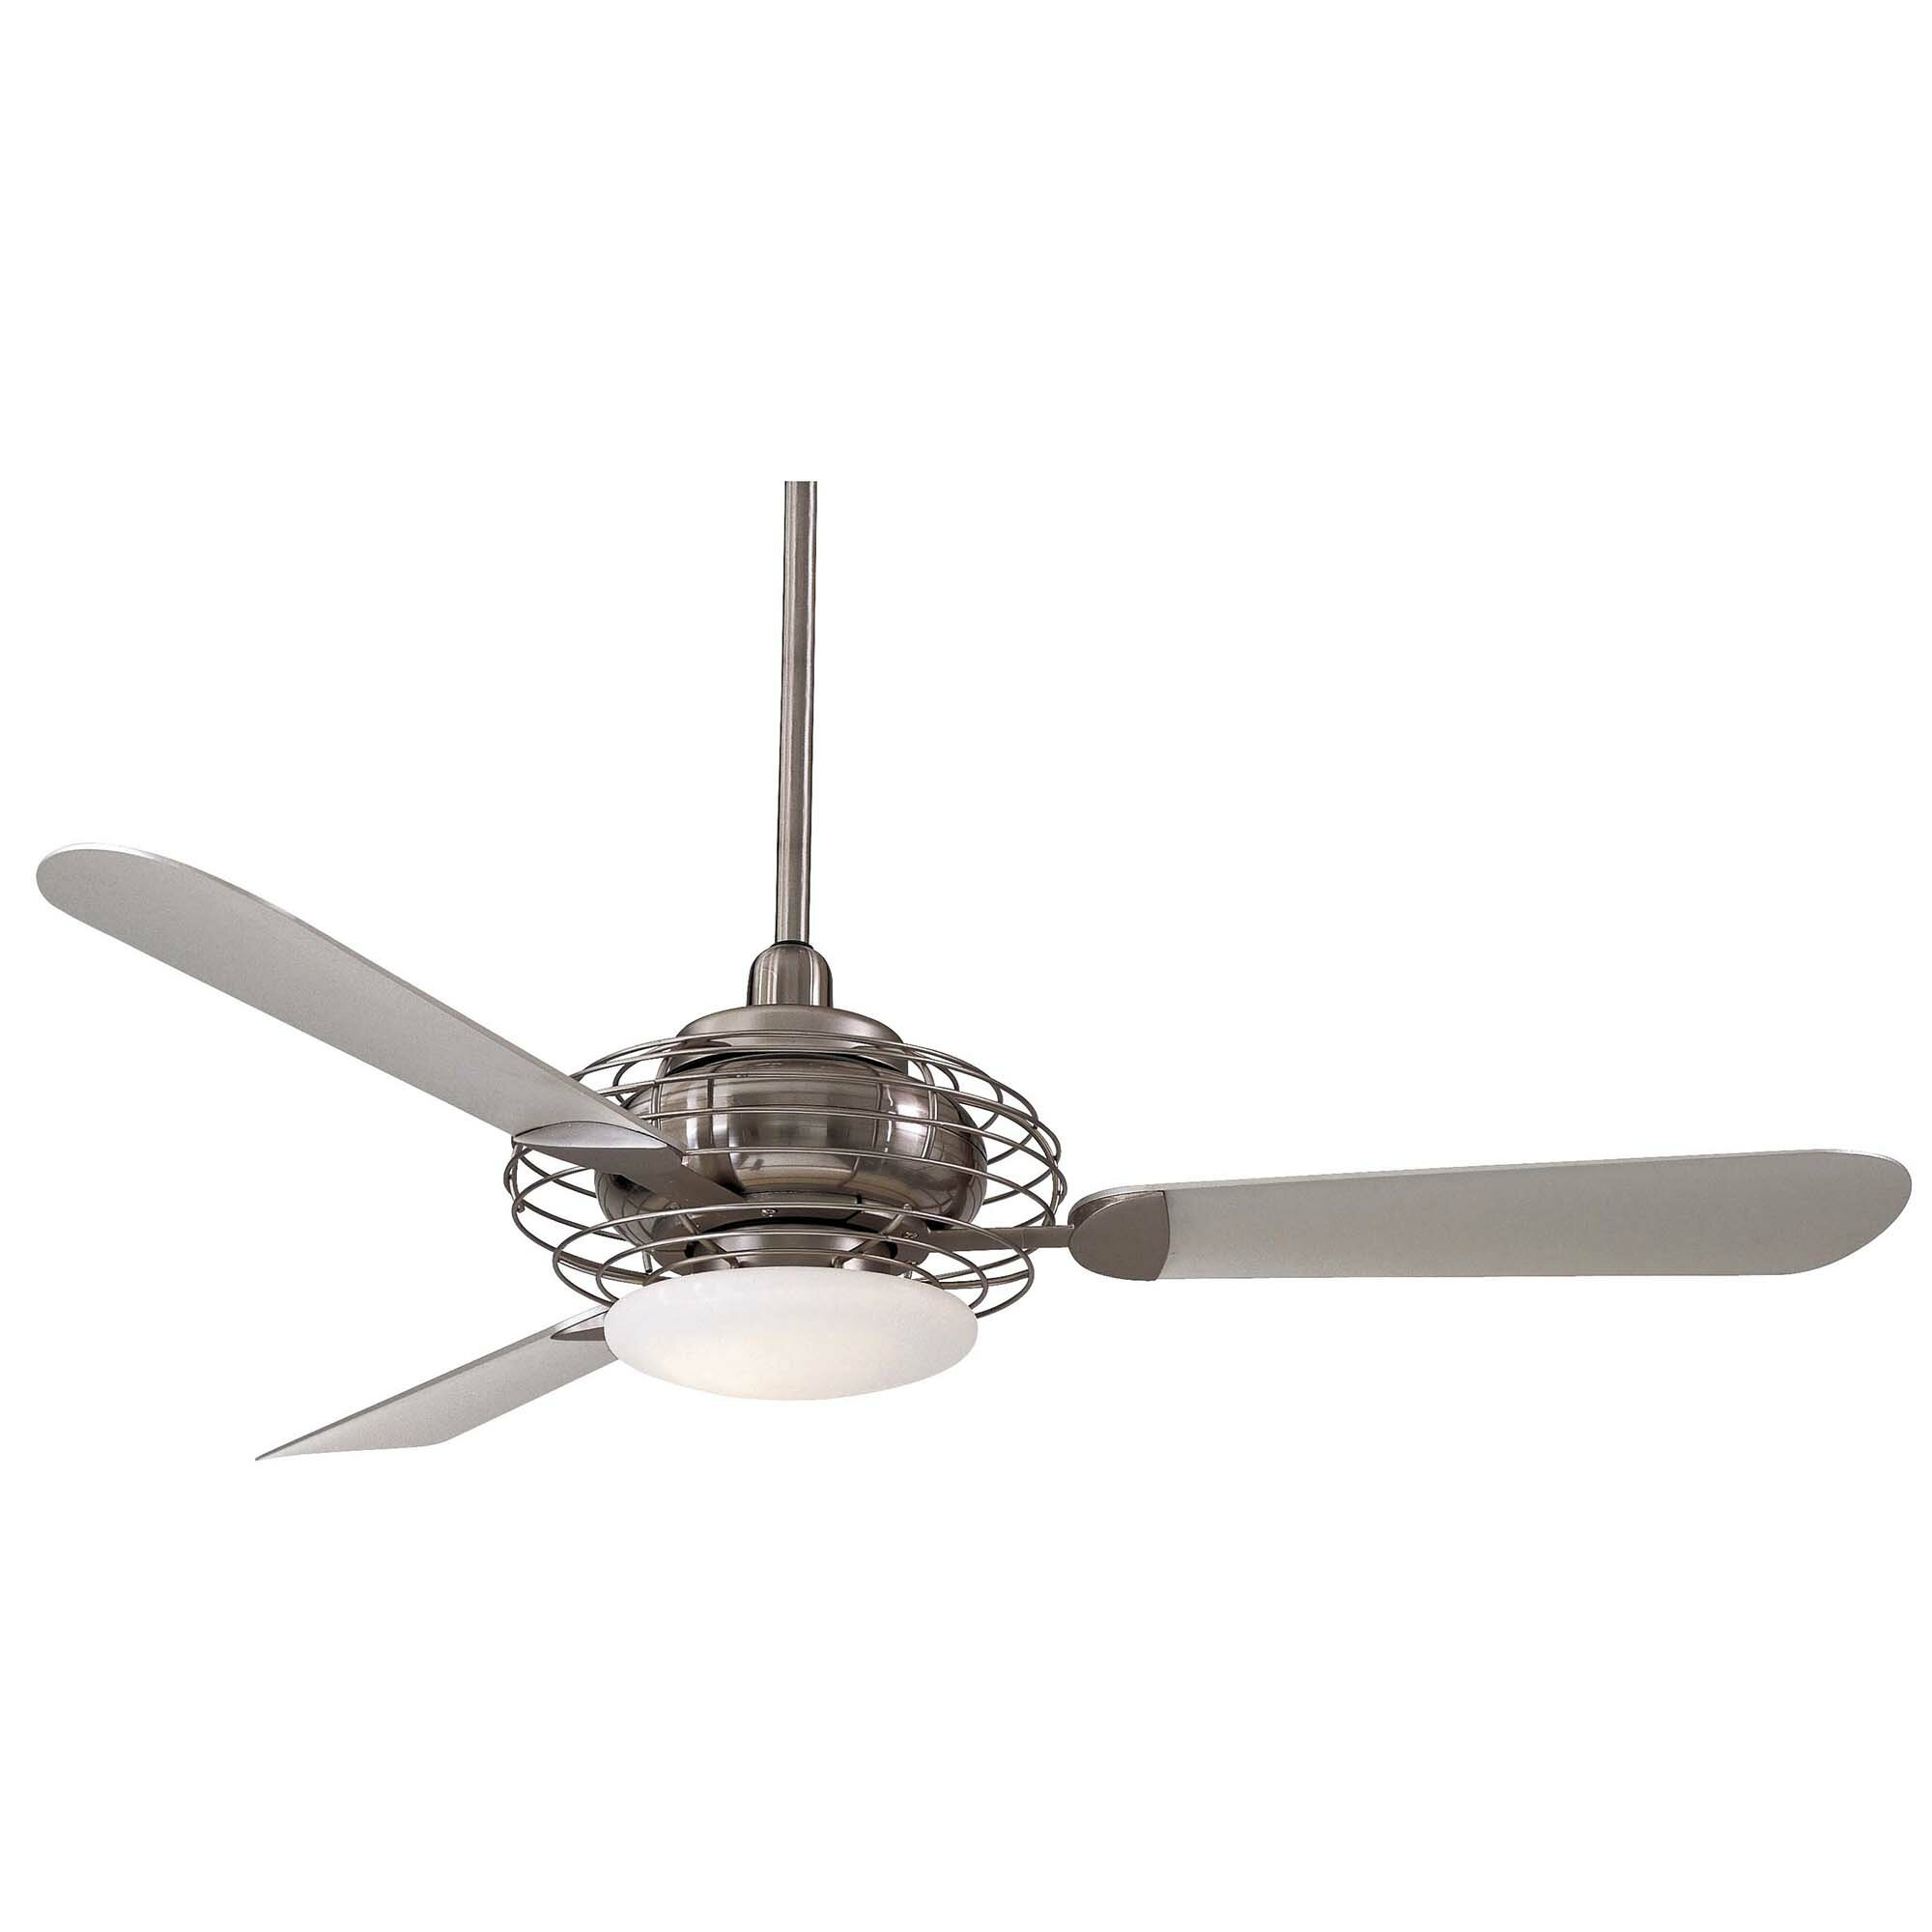 fan blade allo mini ventair ceiling rust spyda anti three new itm plastic with ceilings